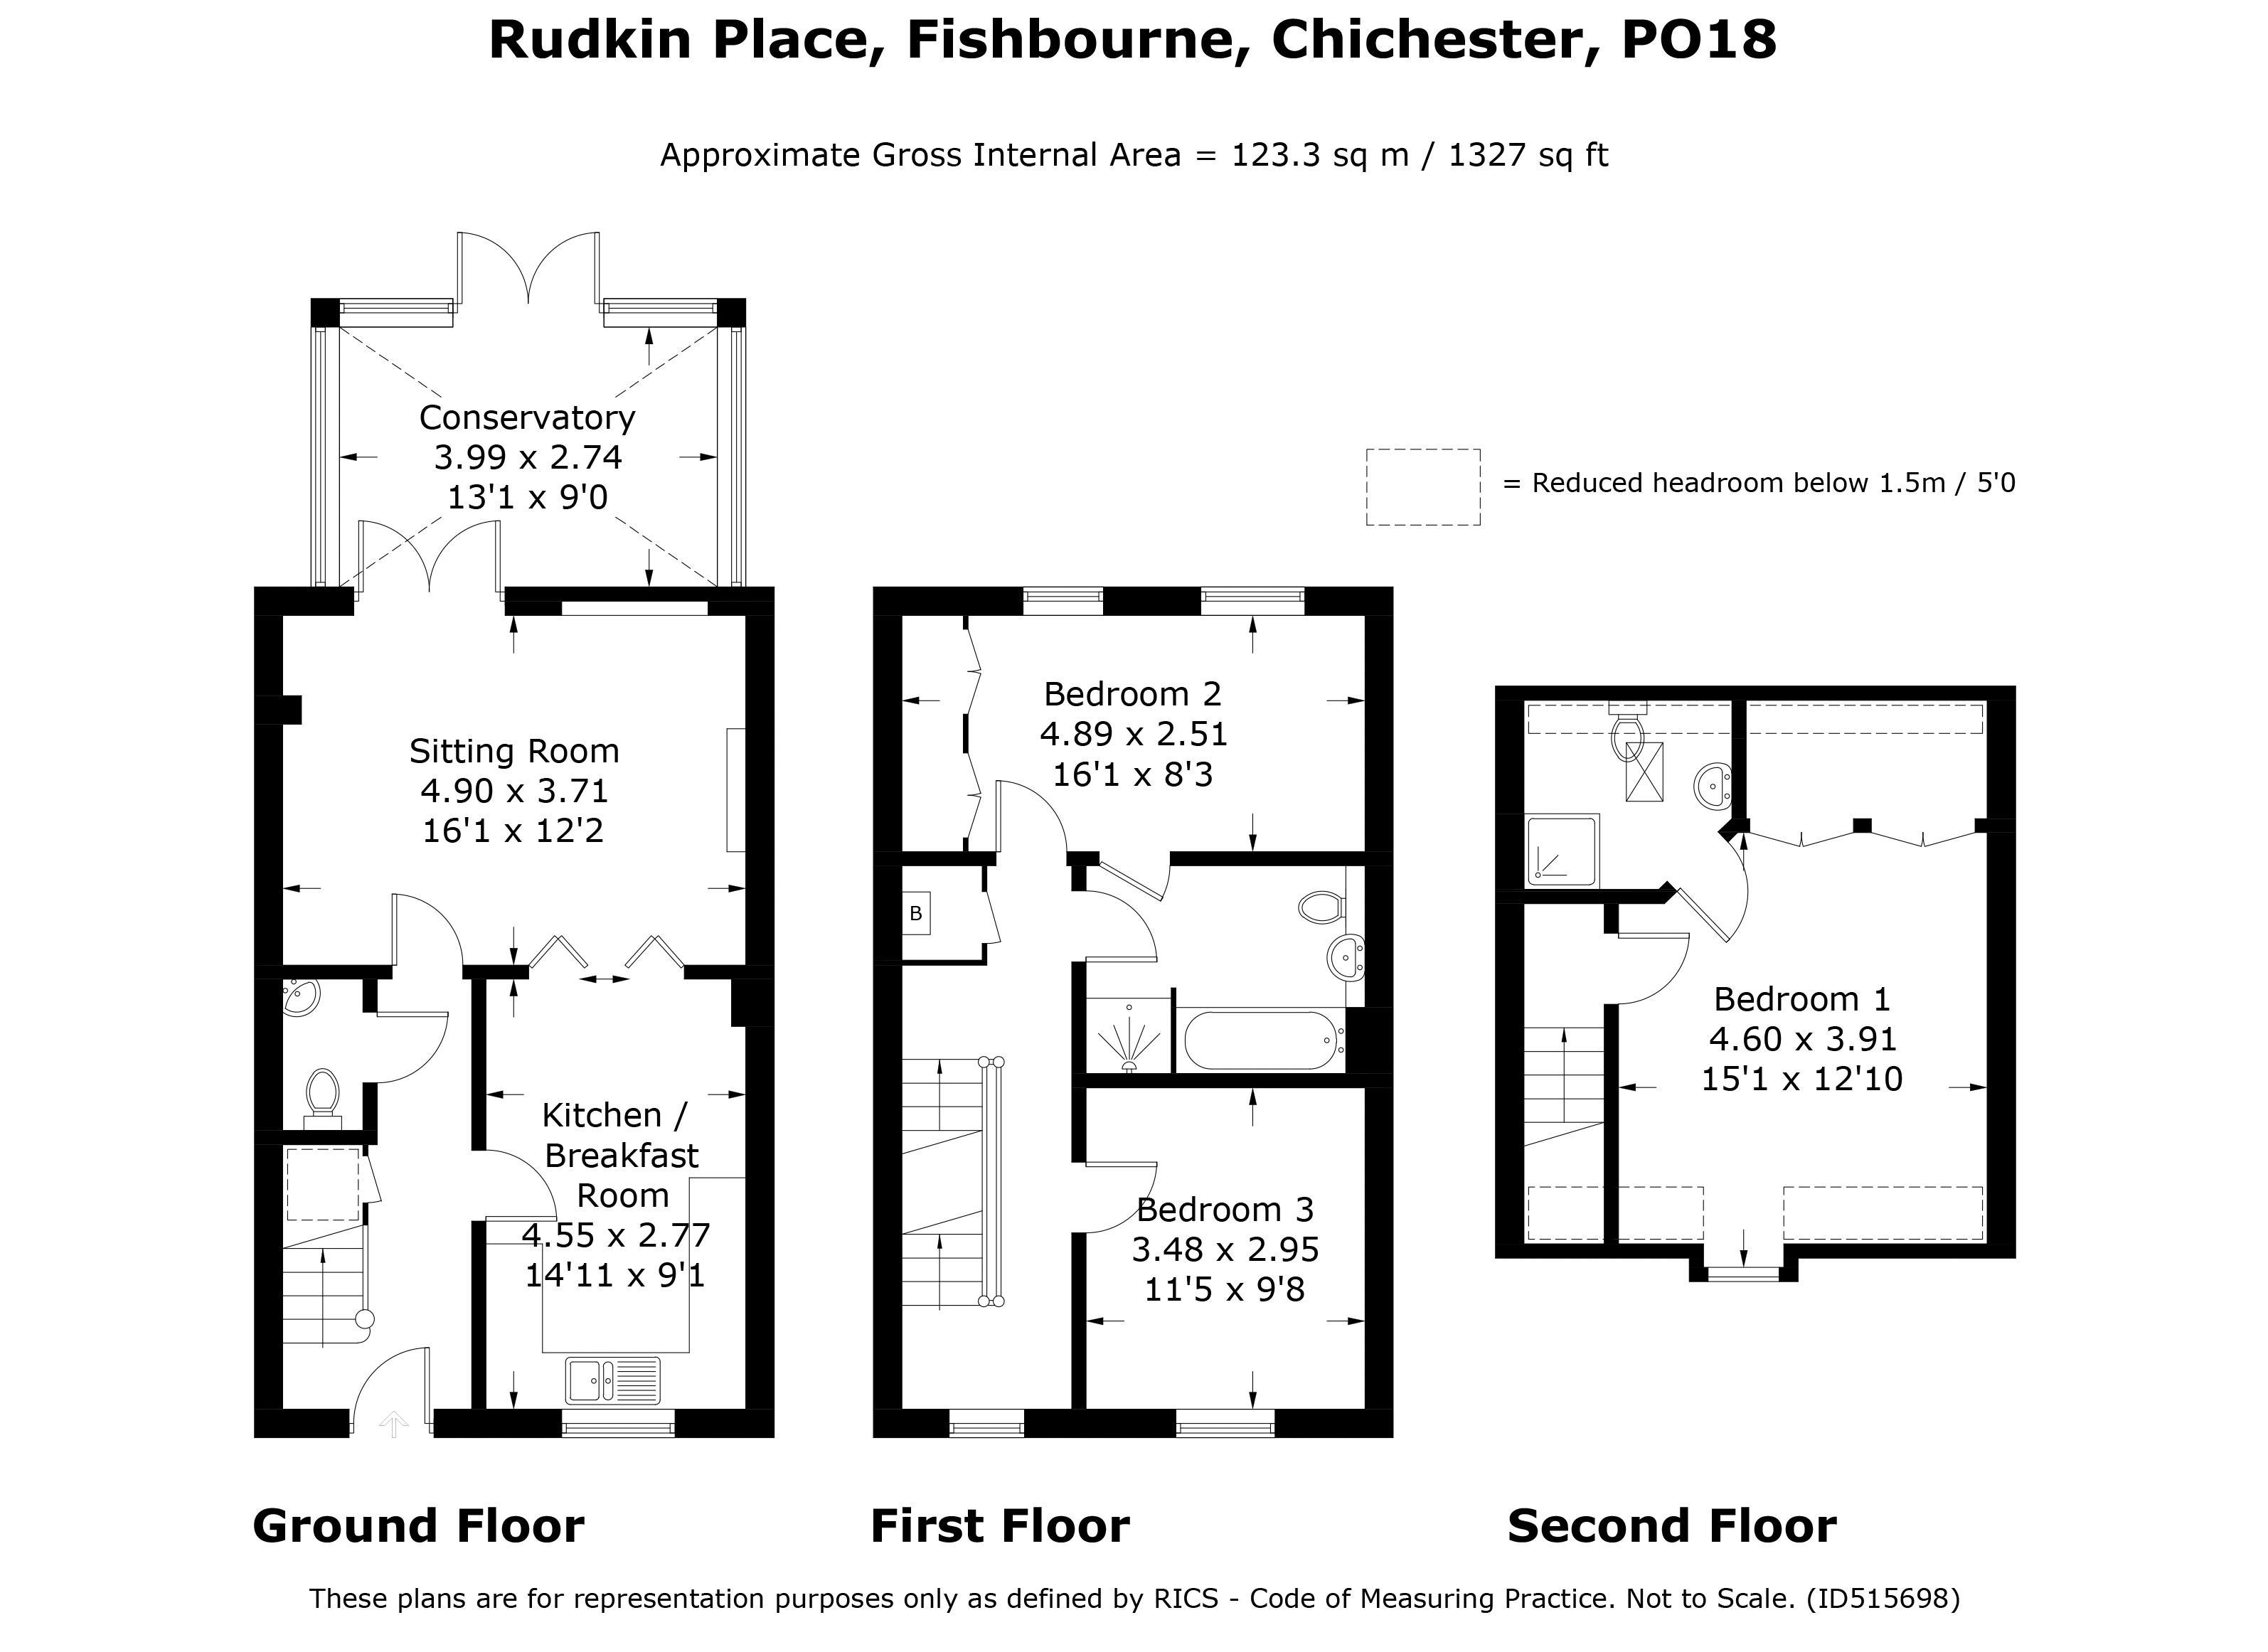 Rudkin Place Fishbourne